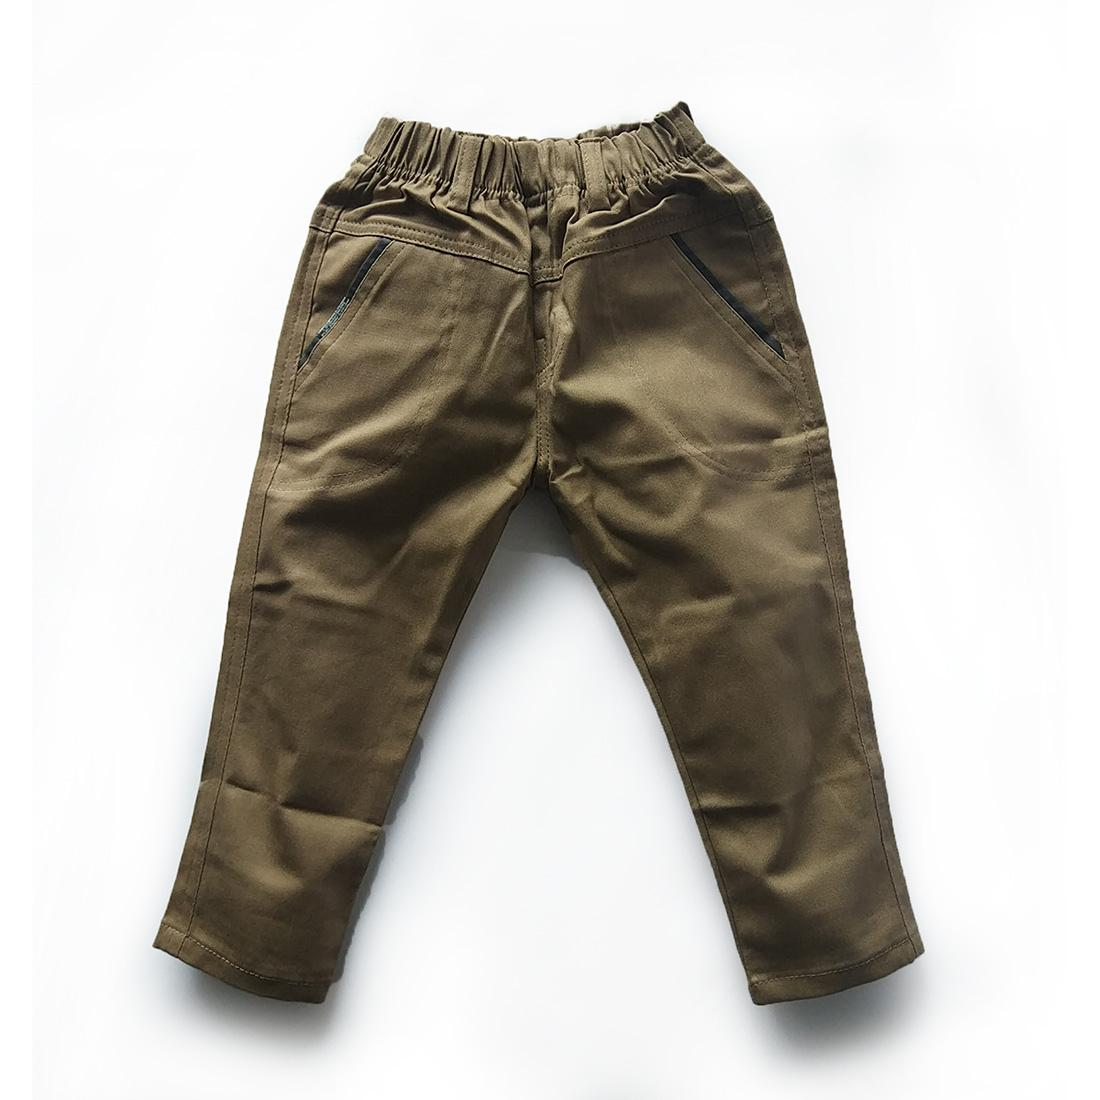 Vigomall Celana anak laki laki usia 9 bln - 10 tahun warna coklat celana panjang anak laki laki chino anak laki laki anak cowok